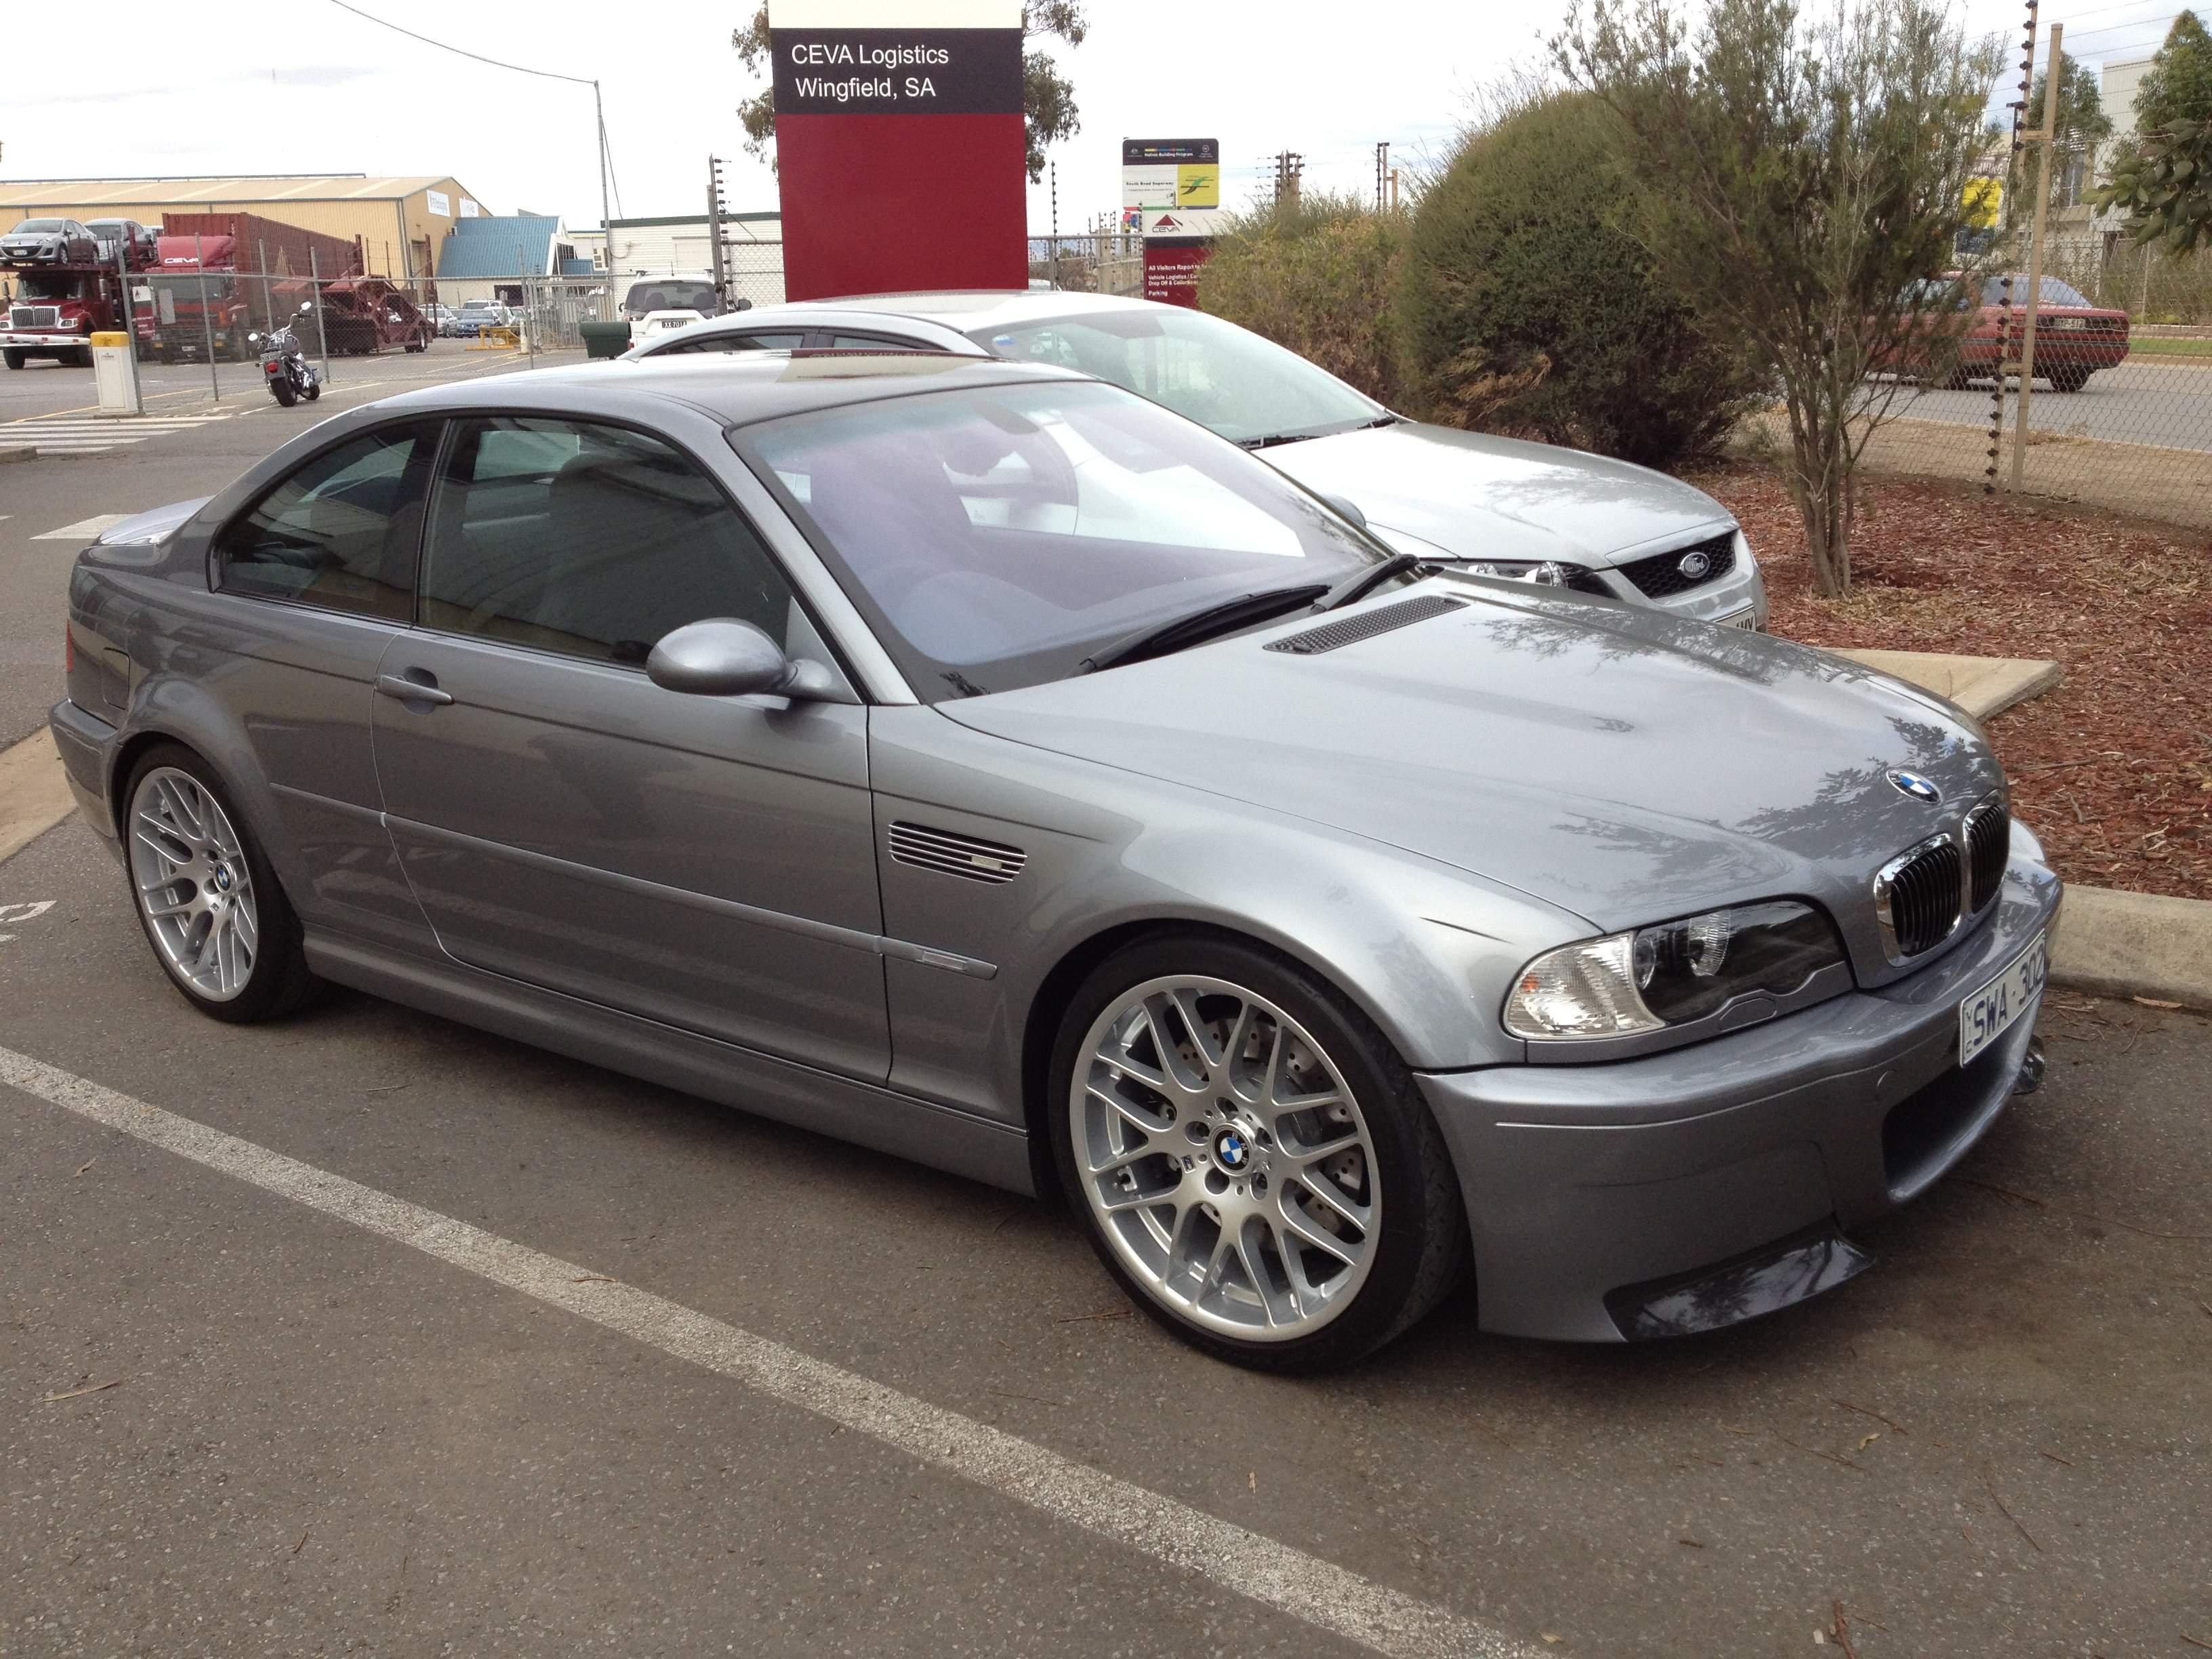 2003_BMW_Coupe_csl_e46_m_3_uk_spec_3264x2448.jpg